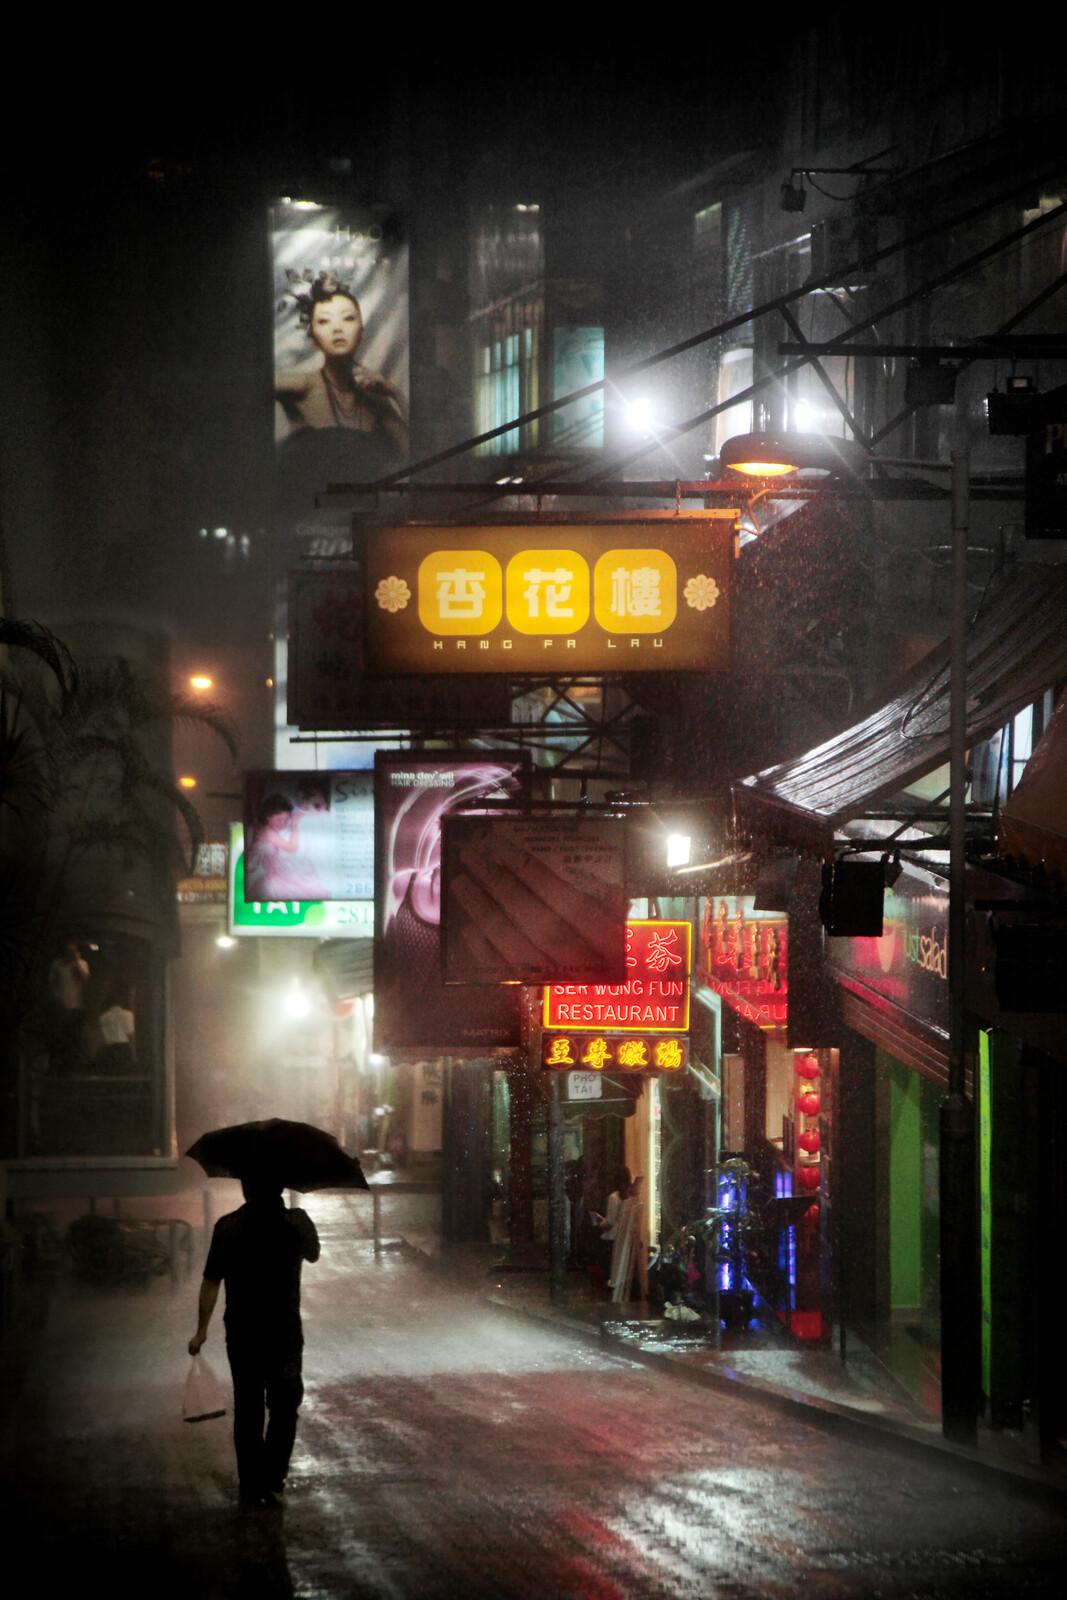 Night Lights - Christophe Jacrot